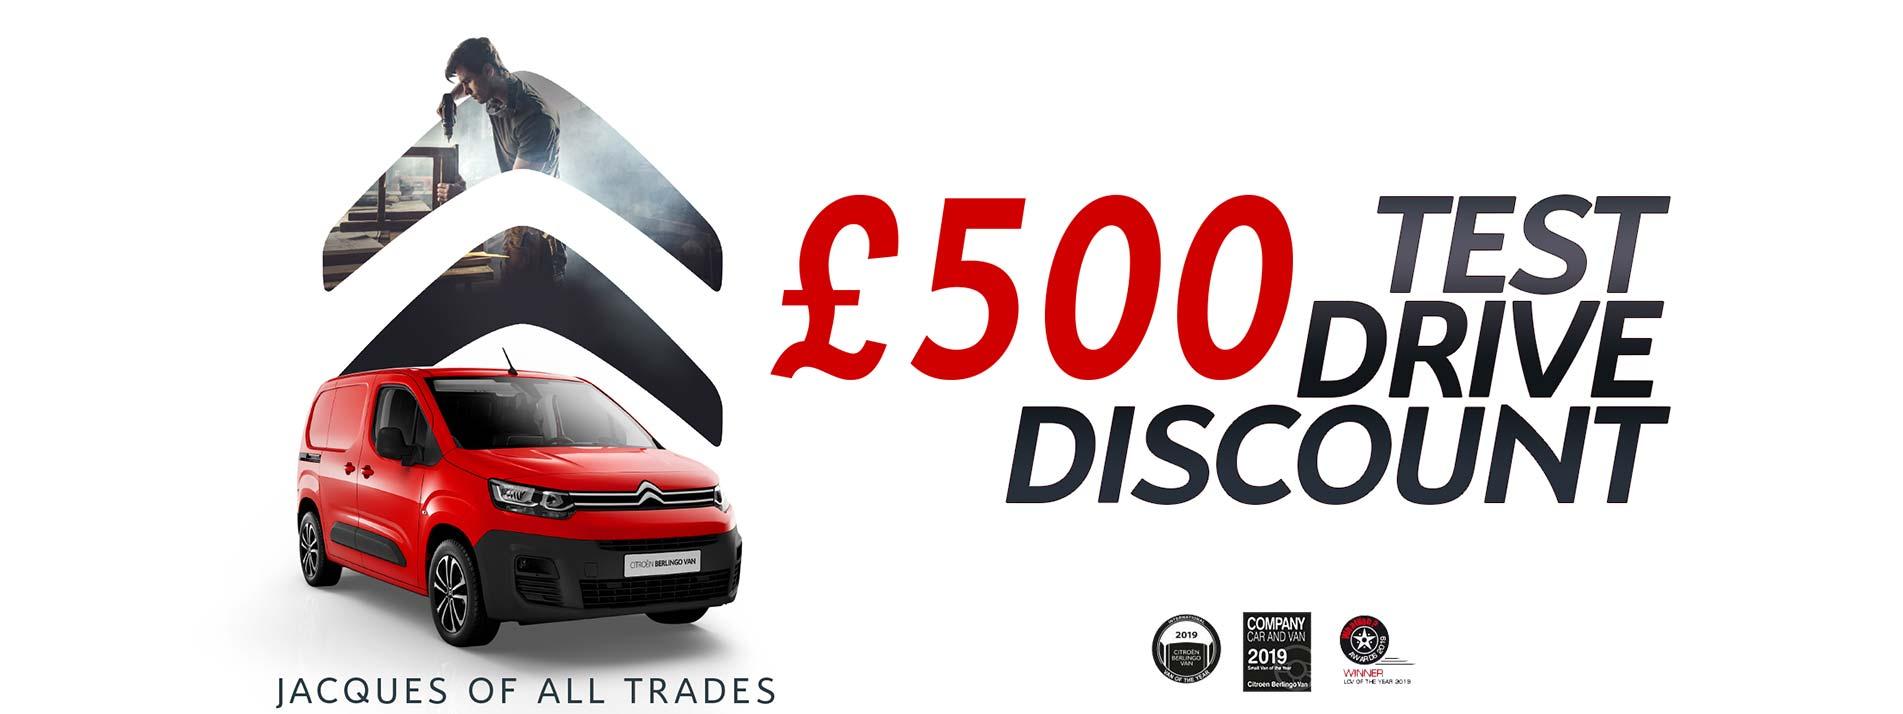 500-pound-test-drive-discount-on-new-citroen-berlingo-van-hampshire-m-sli